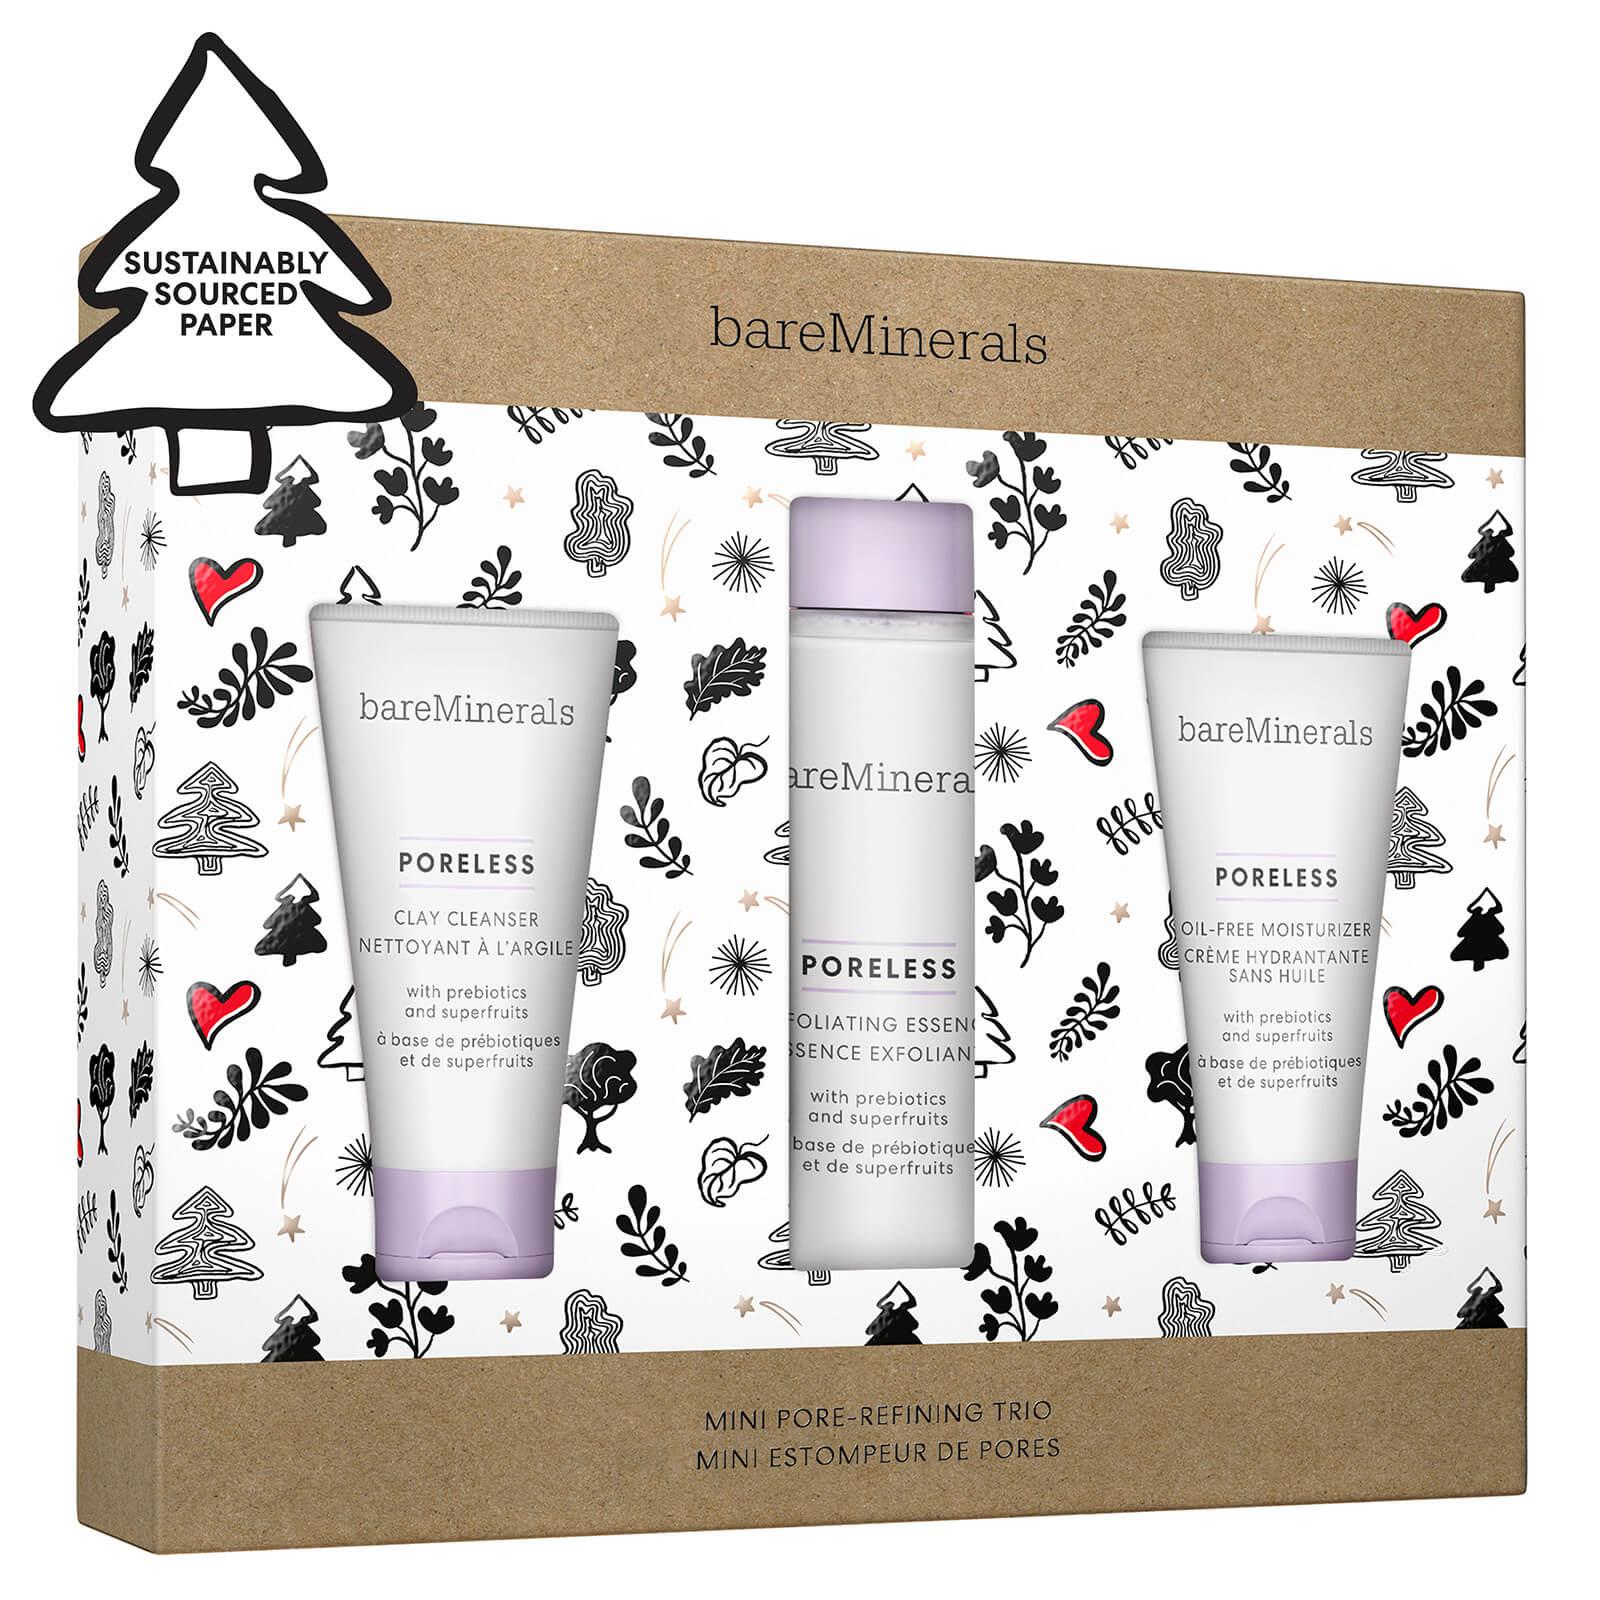 bareMinerals Mini Pore-Refining Skincare Gift Set (Worth £33.00)